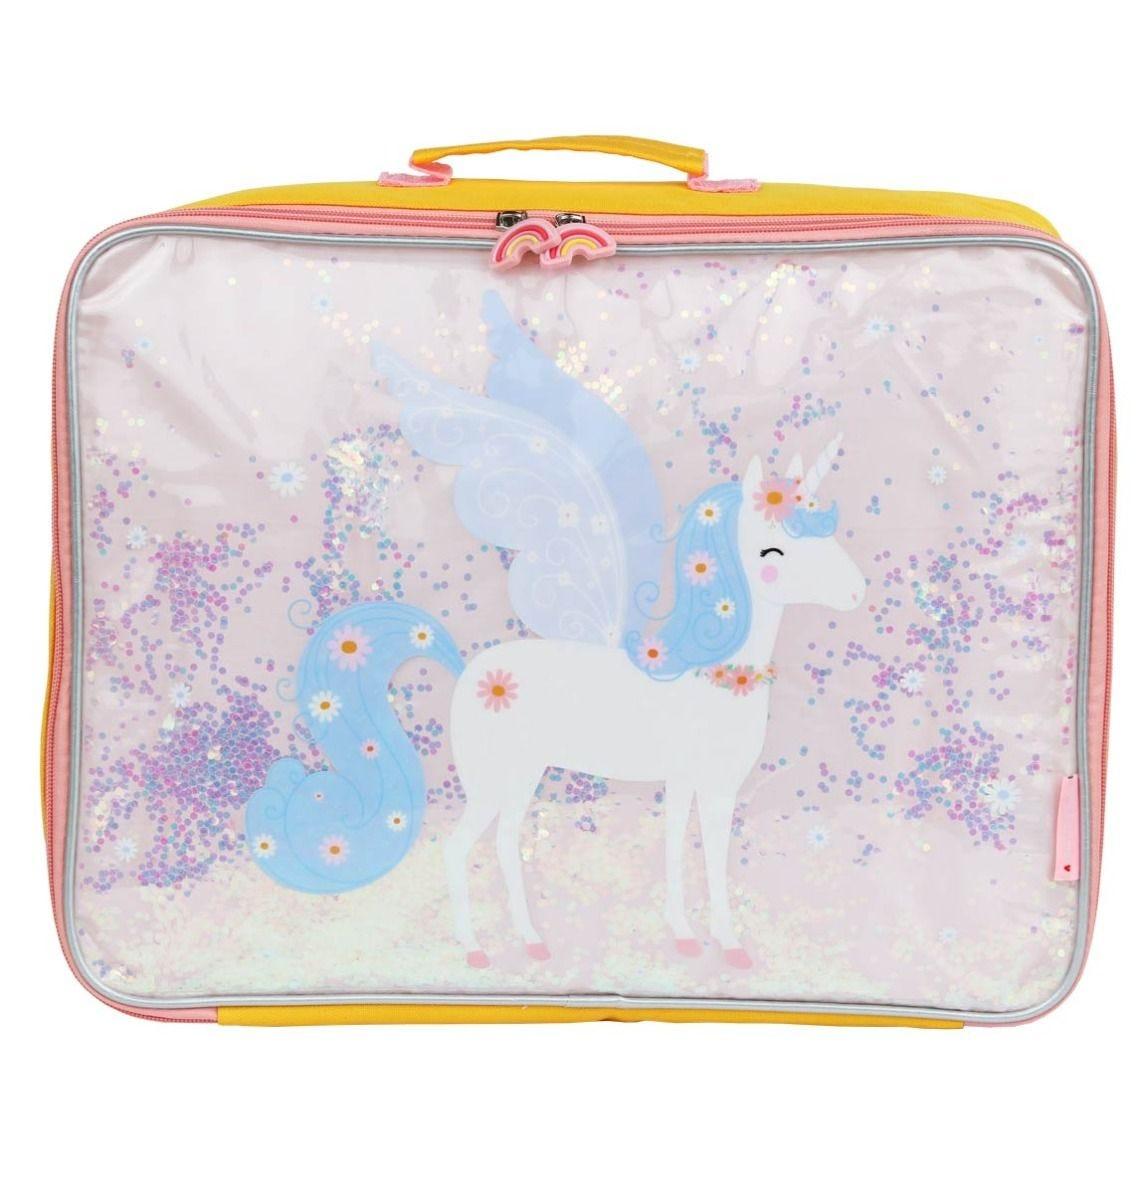 valise-licorne-a-little-lovely-company-petit-d-homme